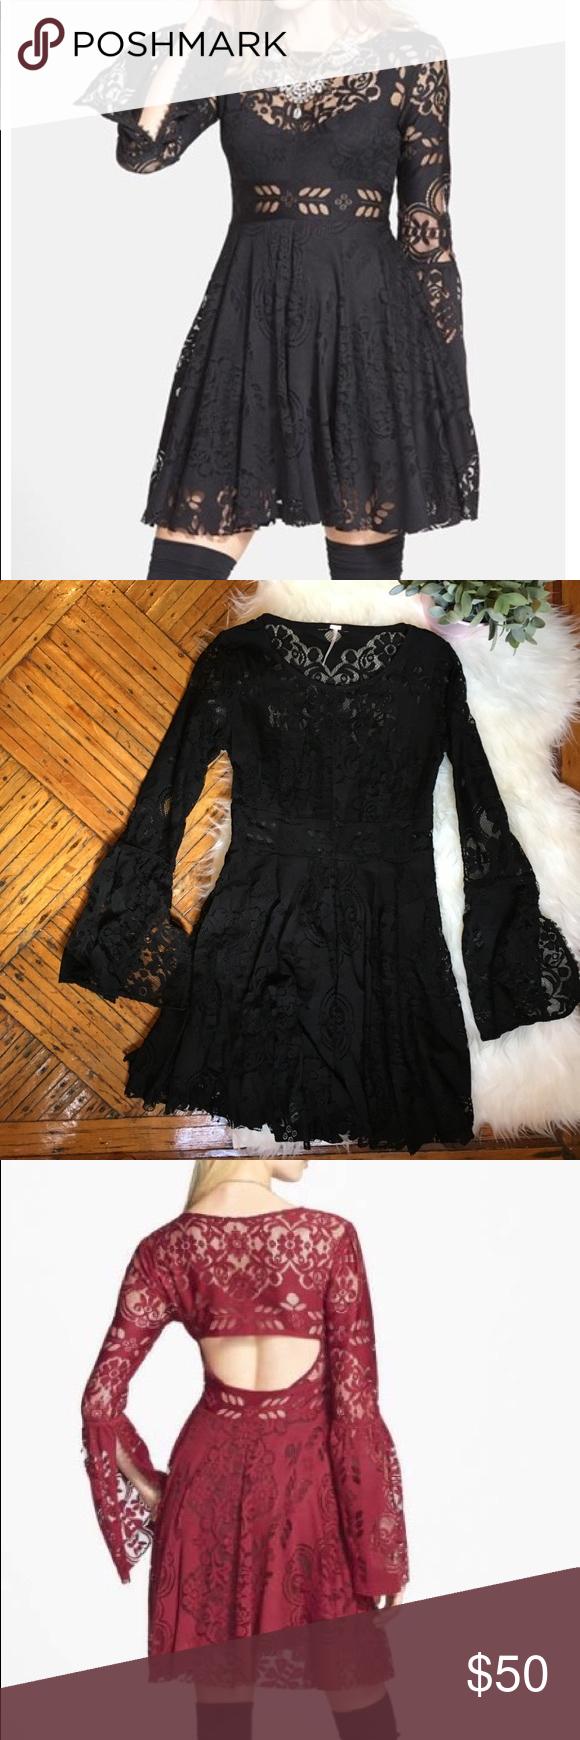 Free people black lace loverus folk song dress